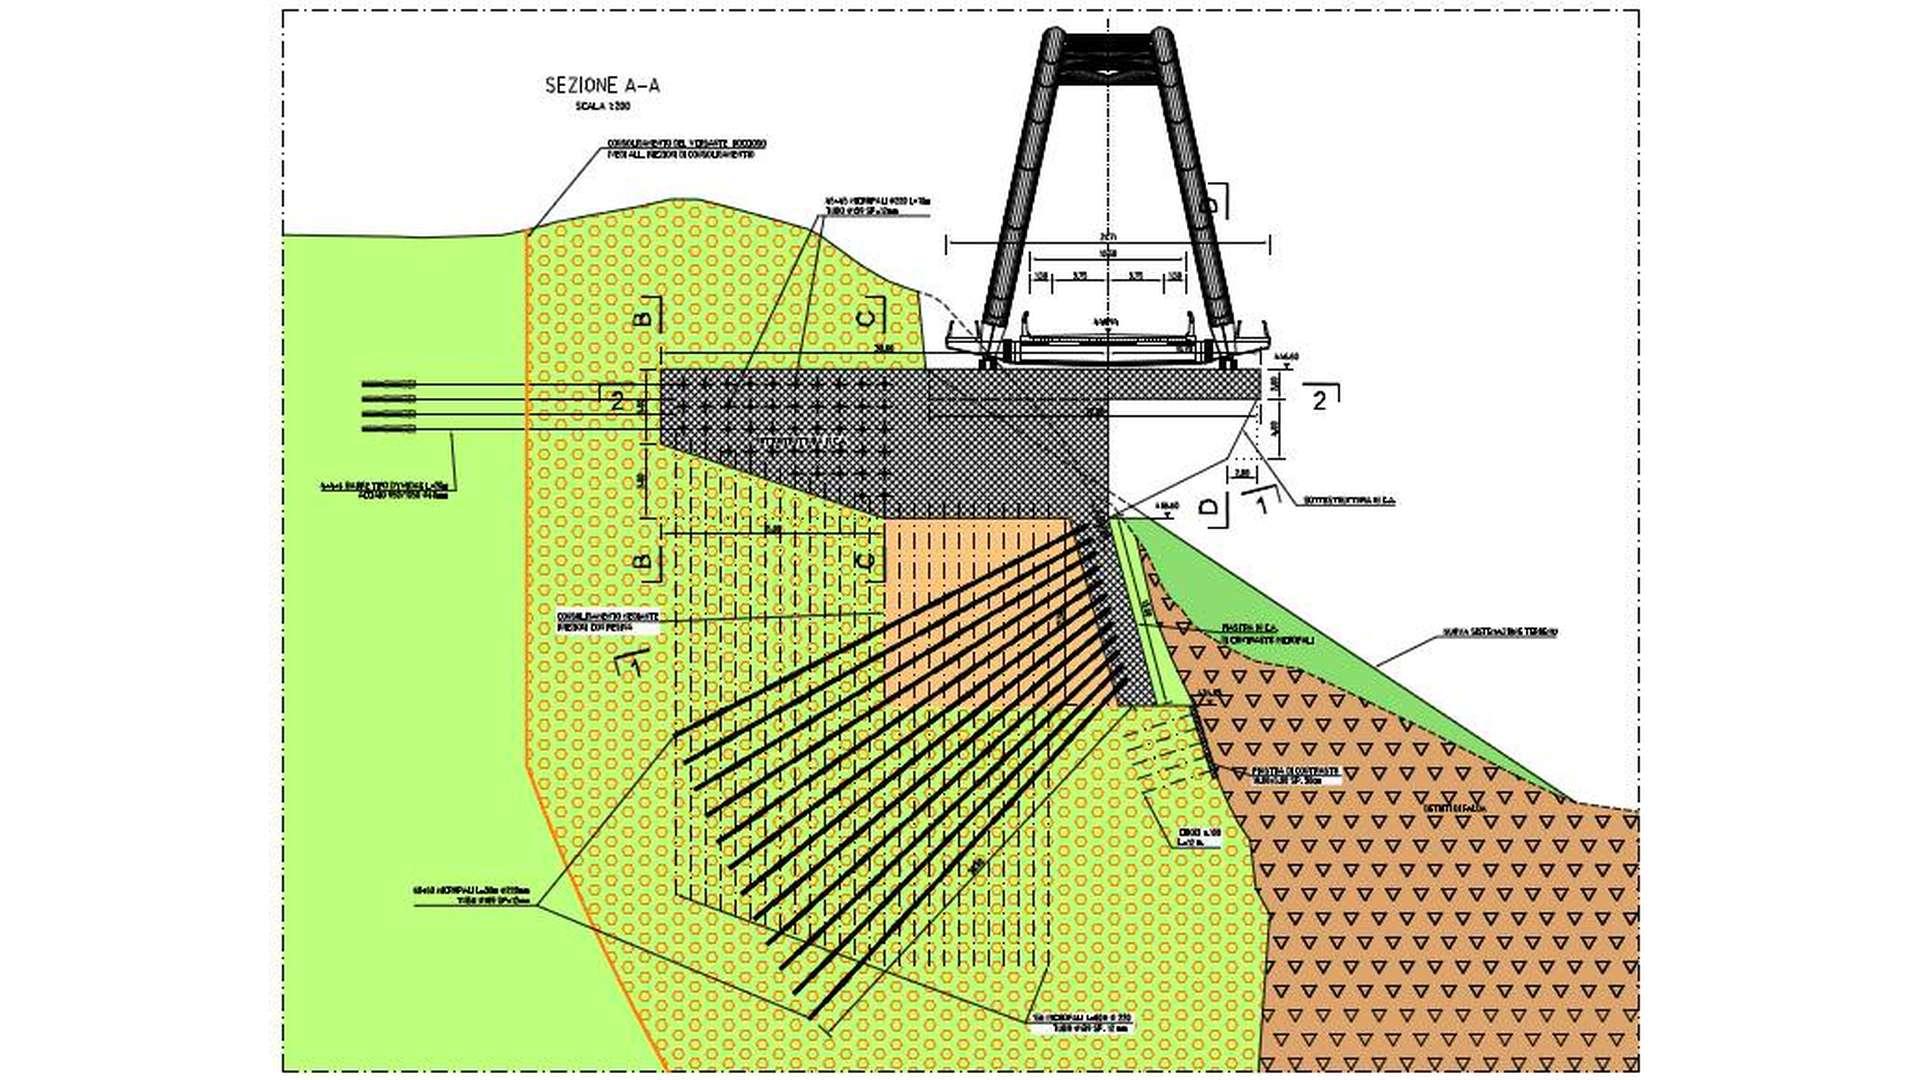 Carnica 001 EFarm studio ingegneria Padova